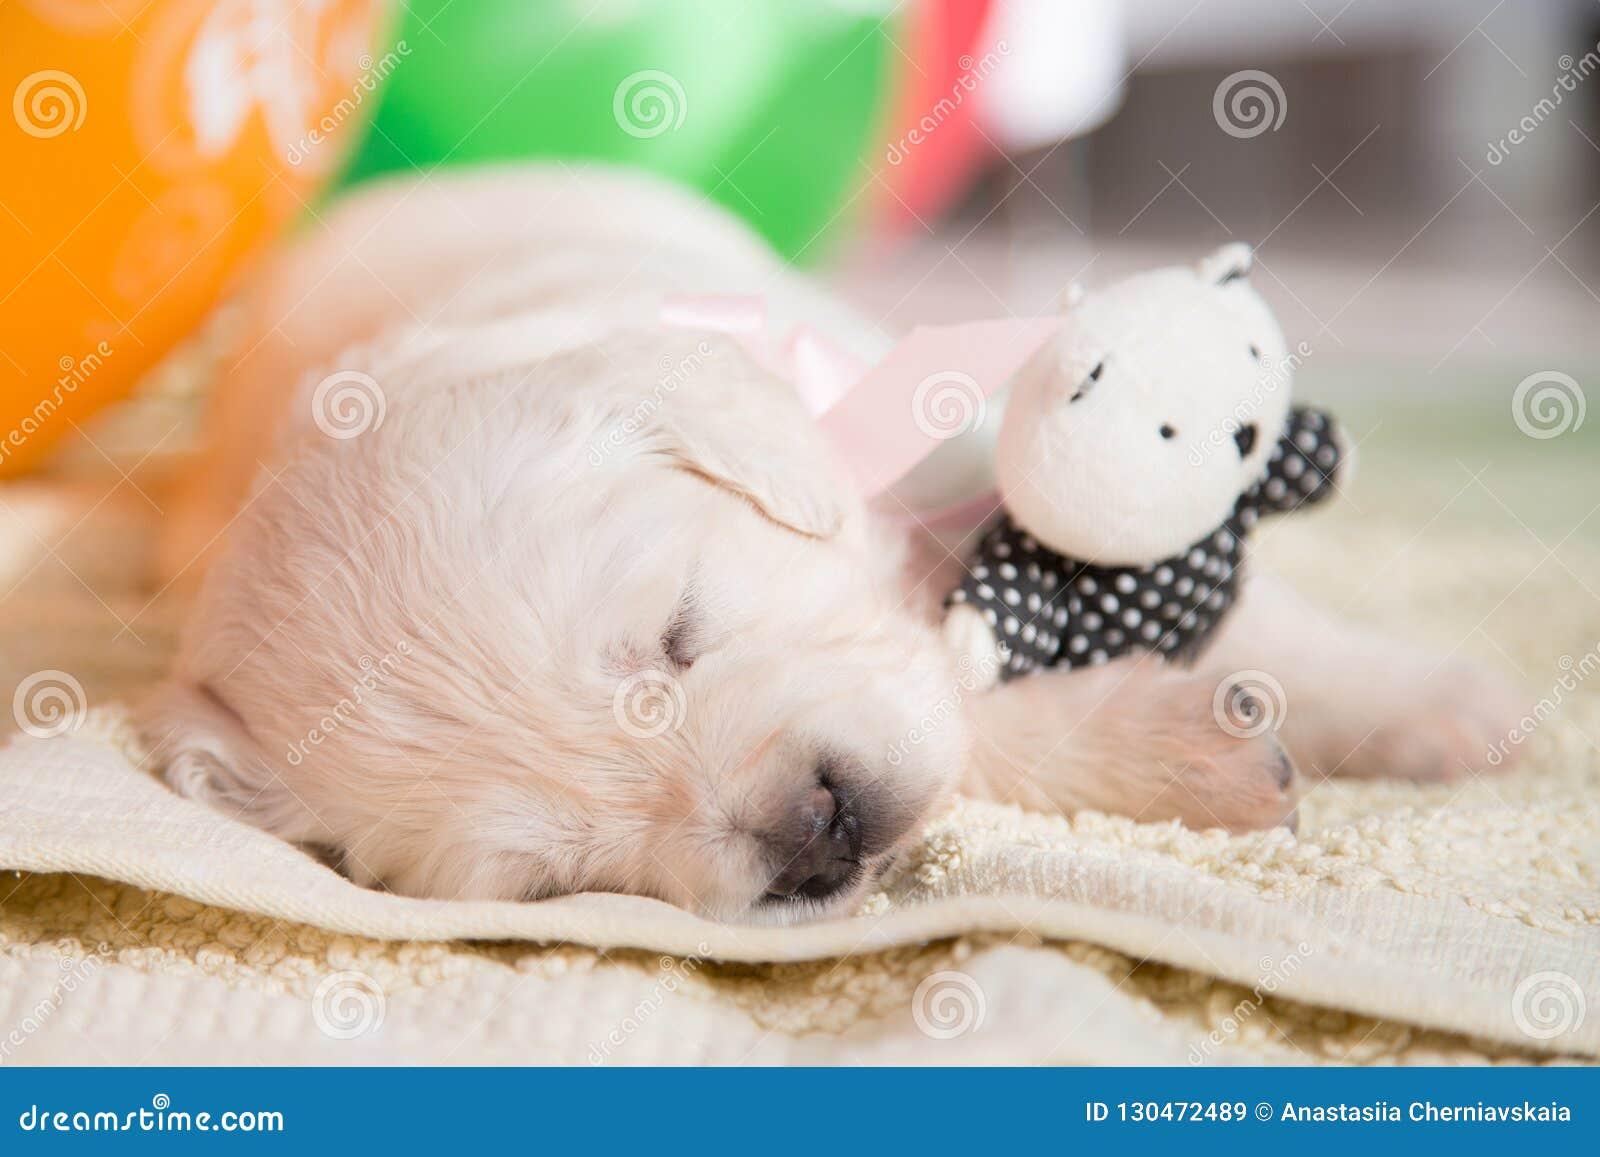 Close-up Image Of Cute Golden Retriever Puppy Sleeping ...